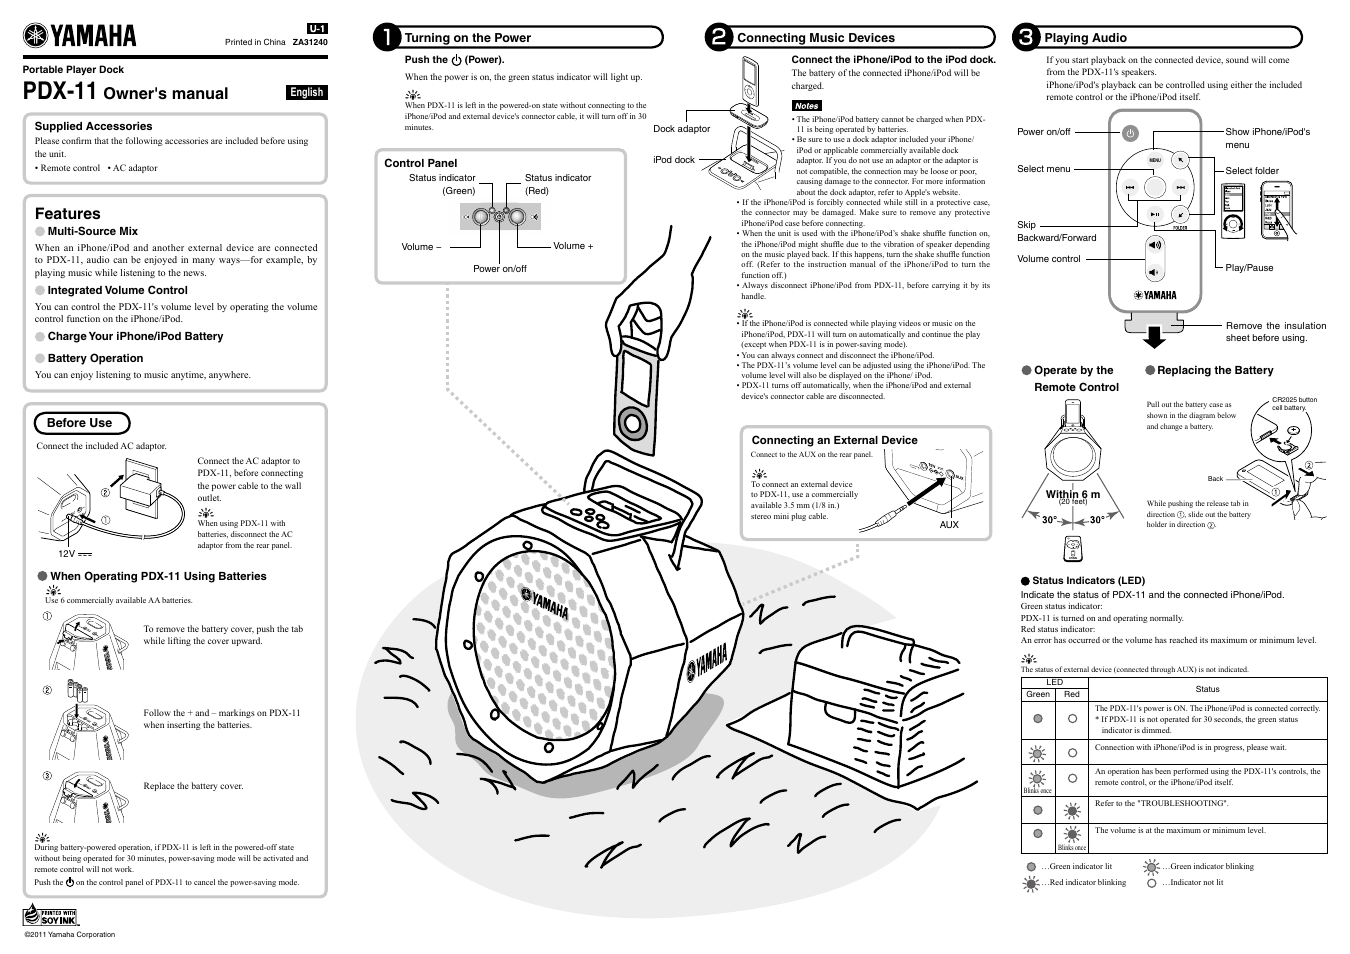 Yamaha Pdx 11 User Manual